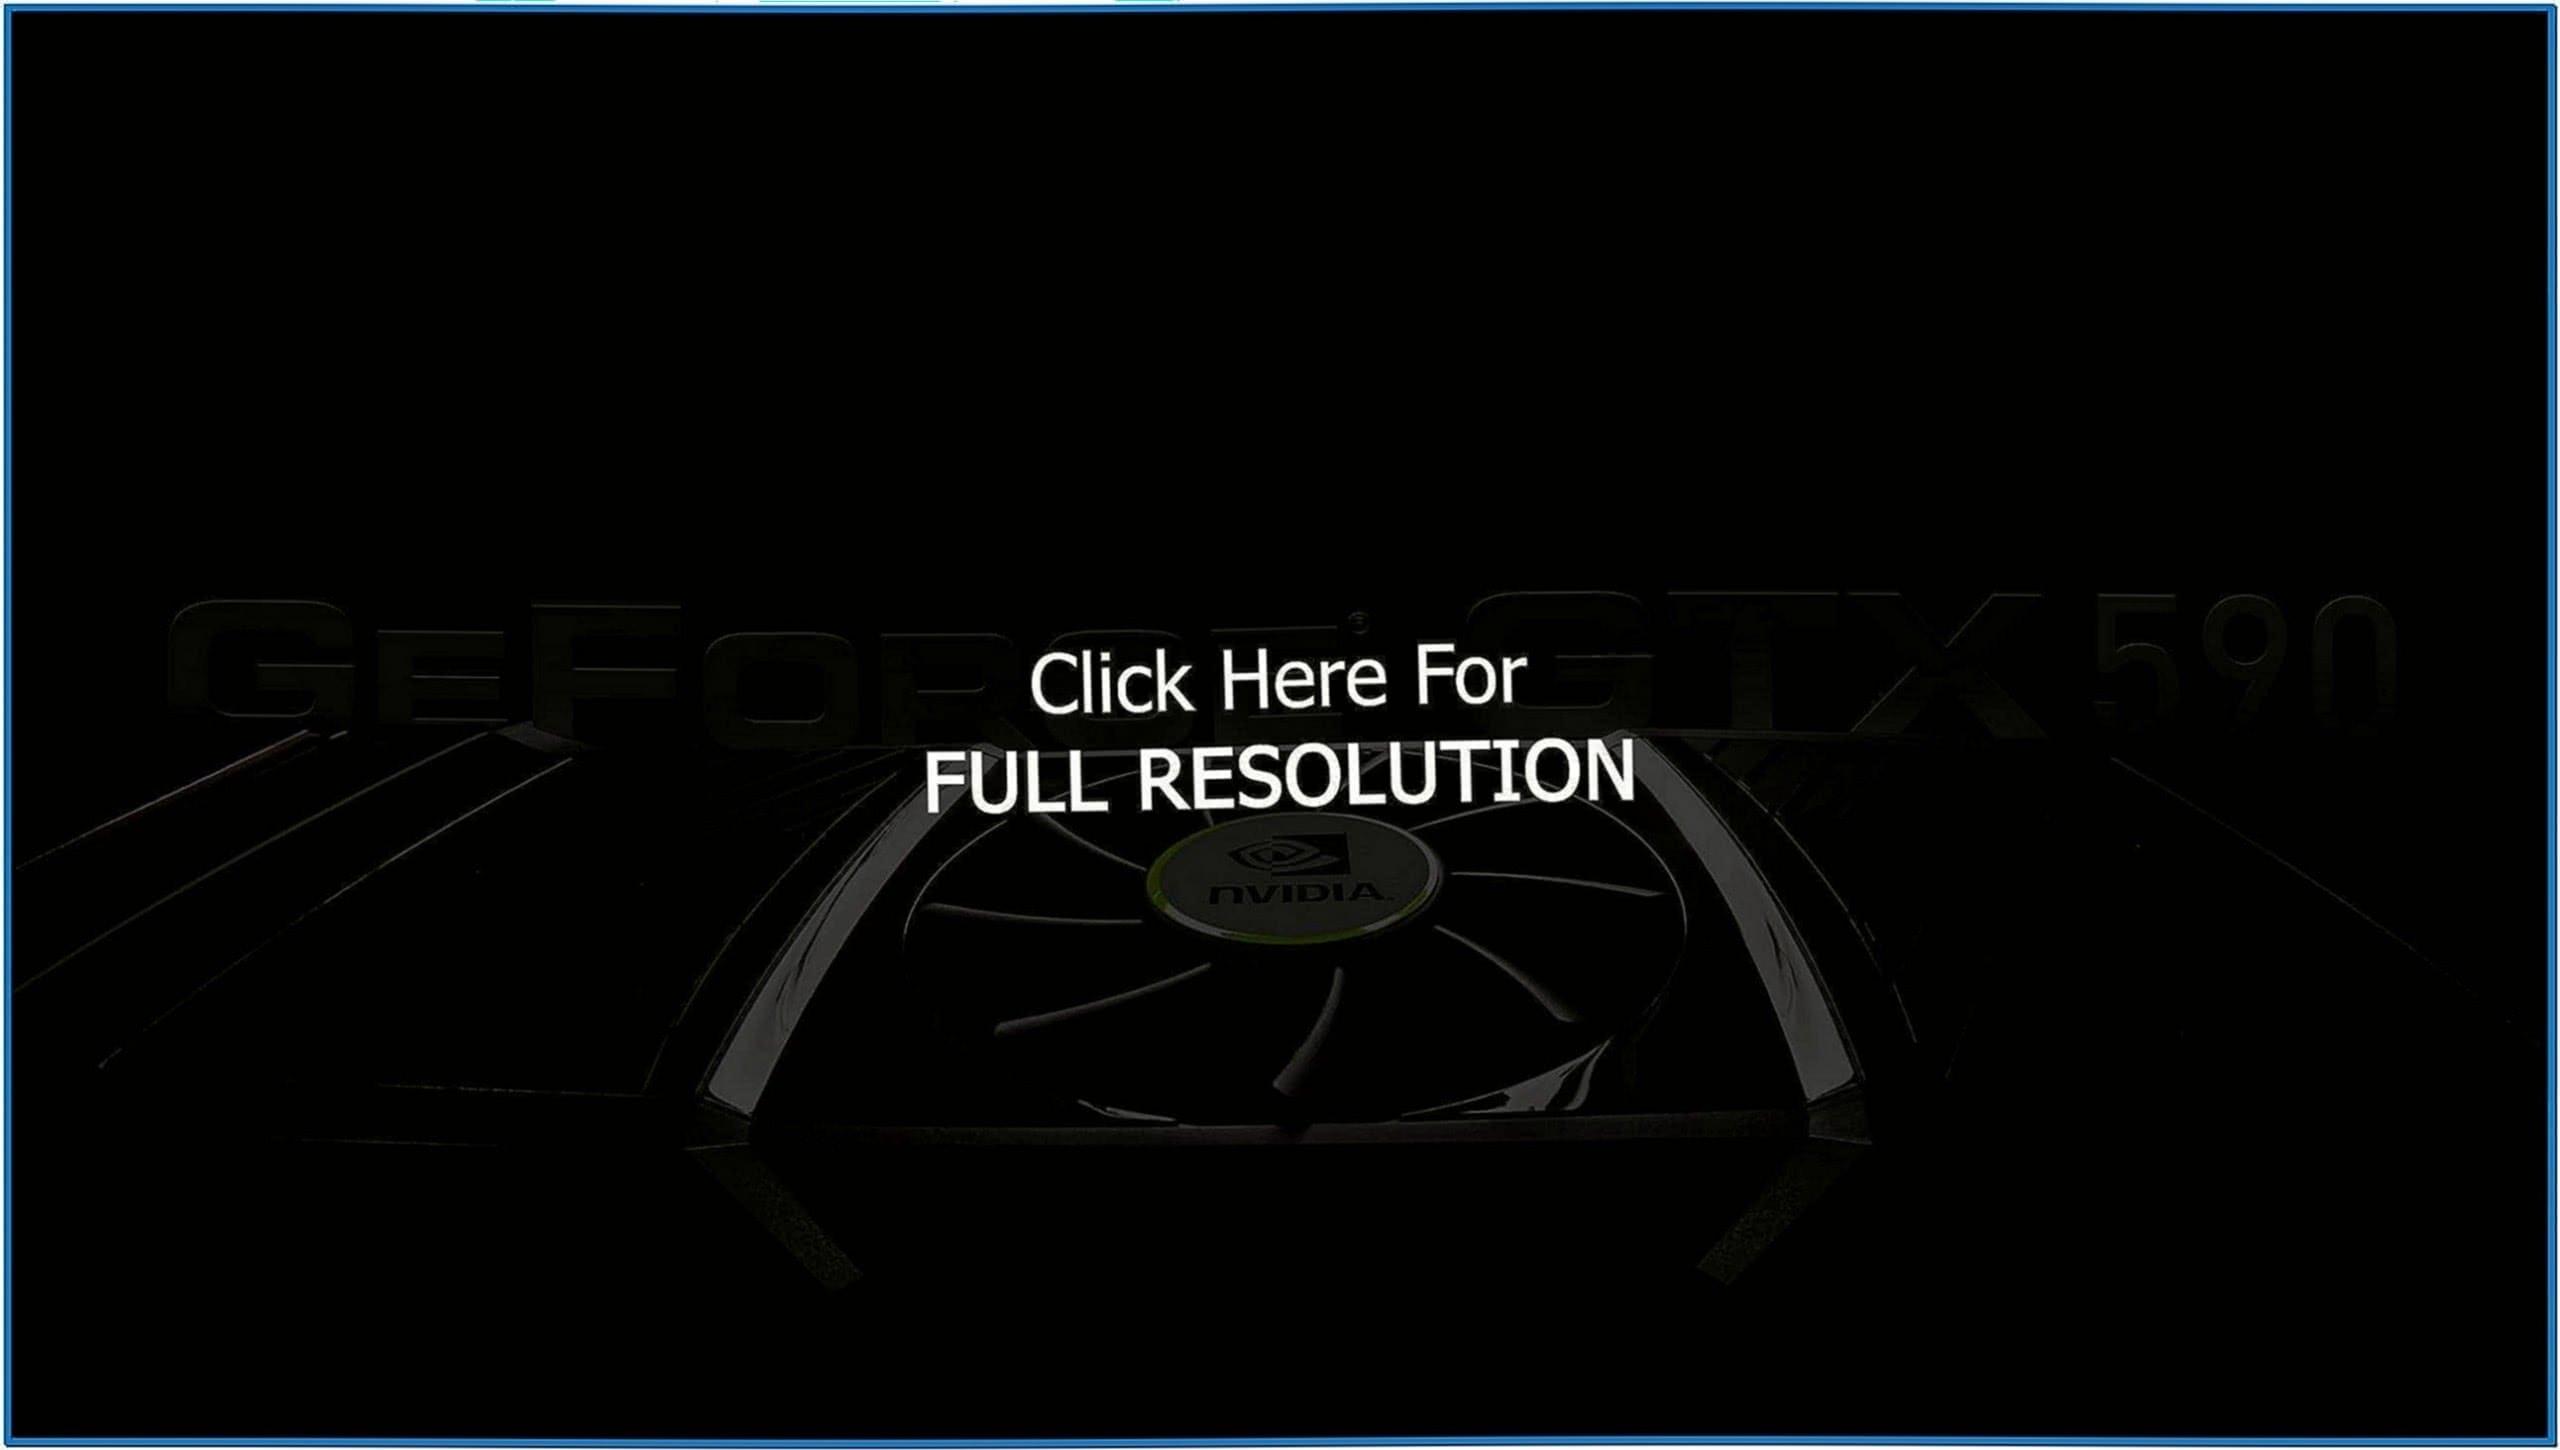 HD Video Screensavers Mac